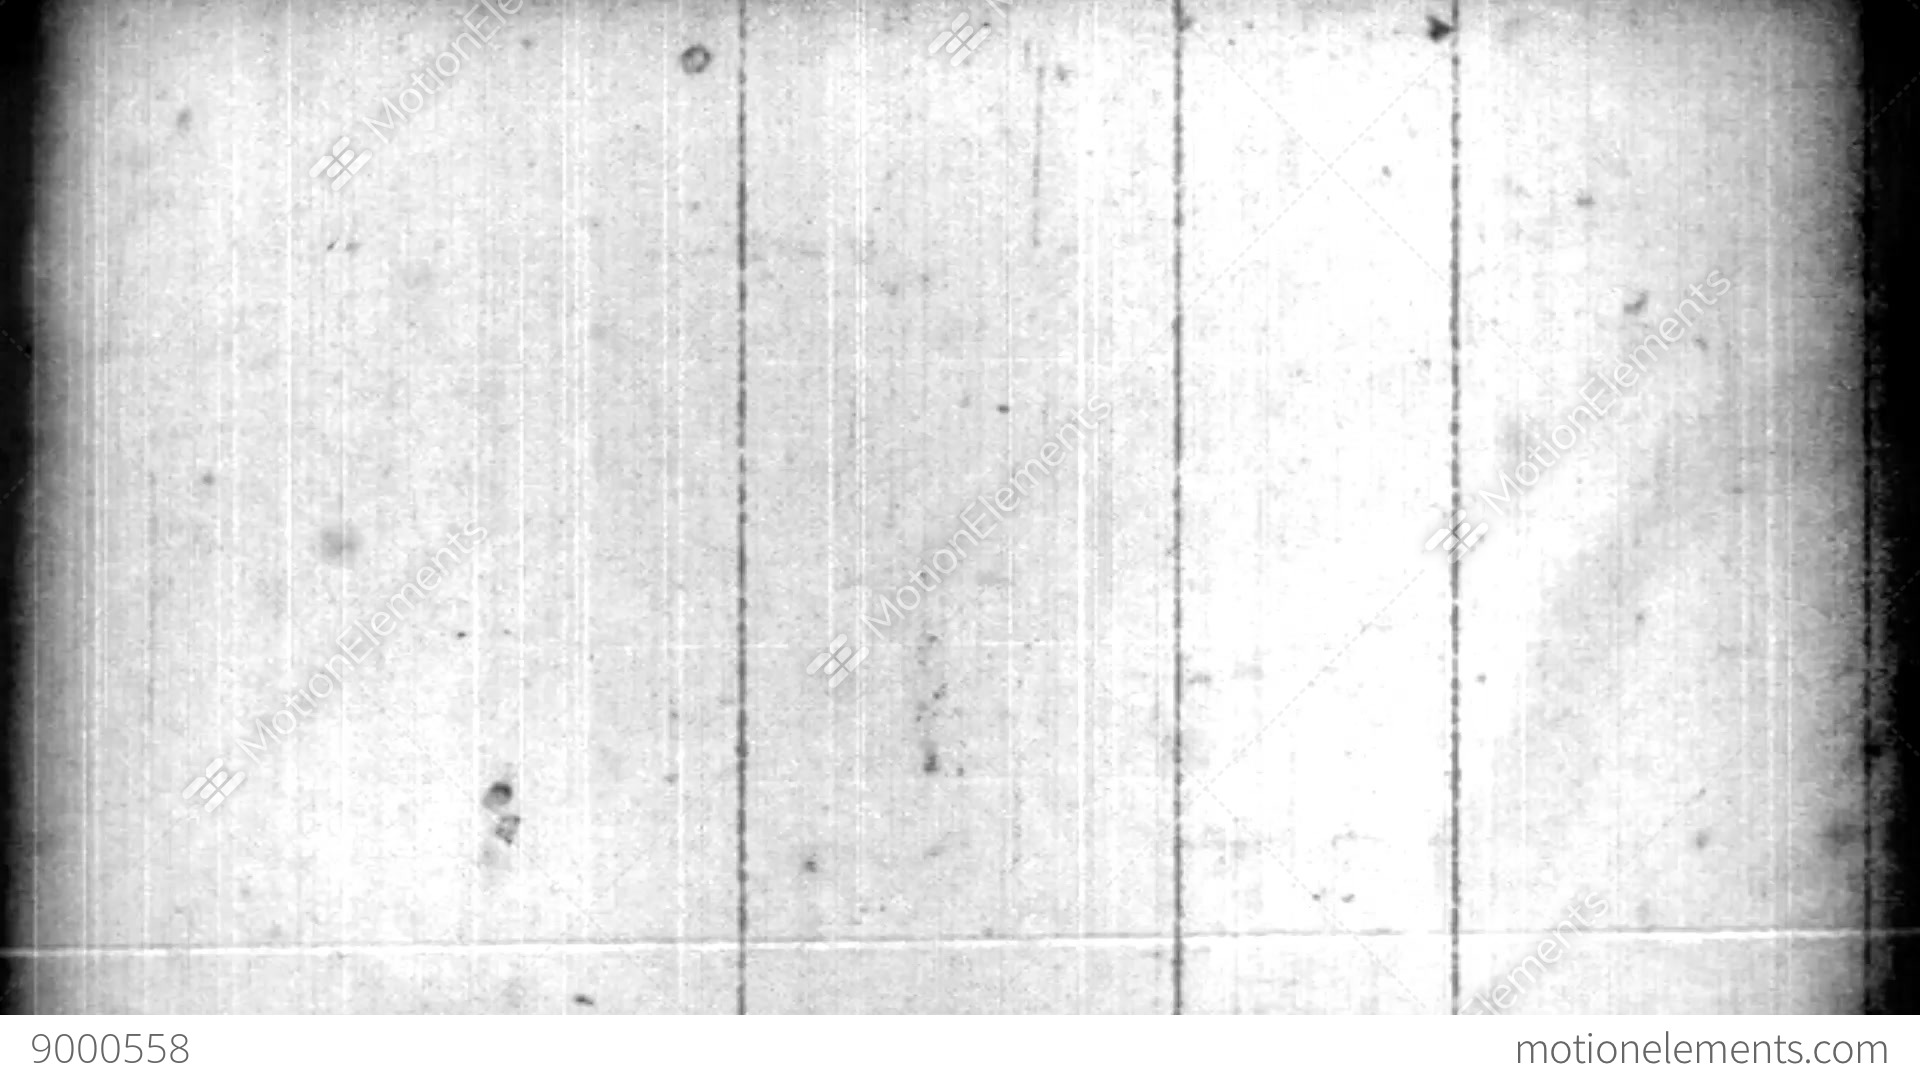 3d Money Wallpaper Old Film Look Paper Texture Stock Video Footage 9000558